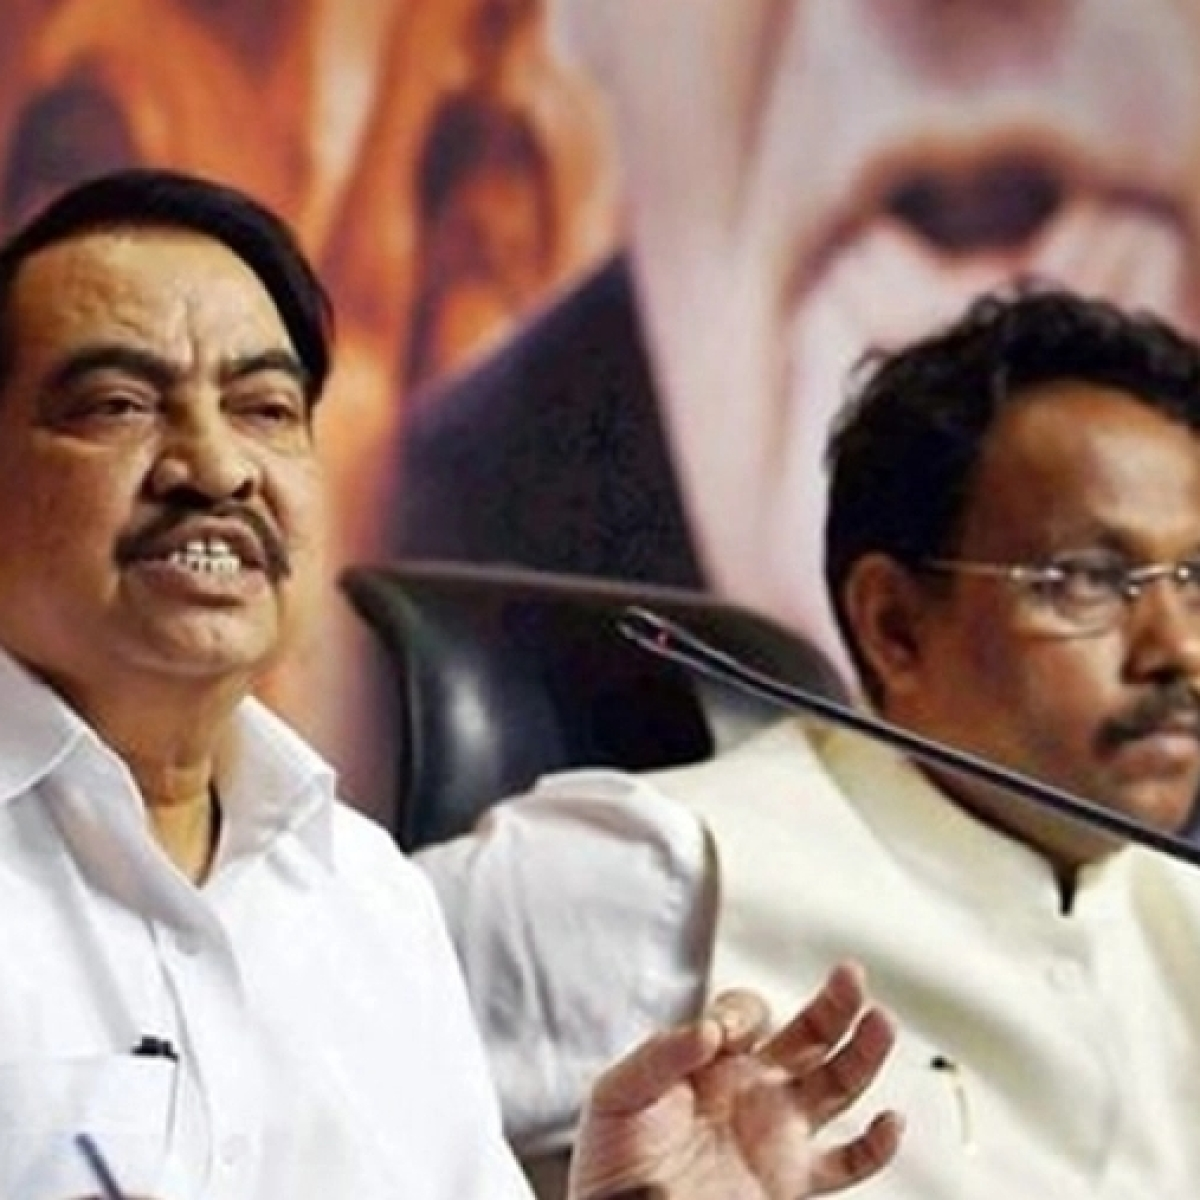 Scams, financial irregularities: Why were biggies like Tawde, Purohit, Khadse, Mehta dropped by BJP?